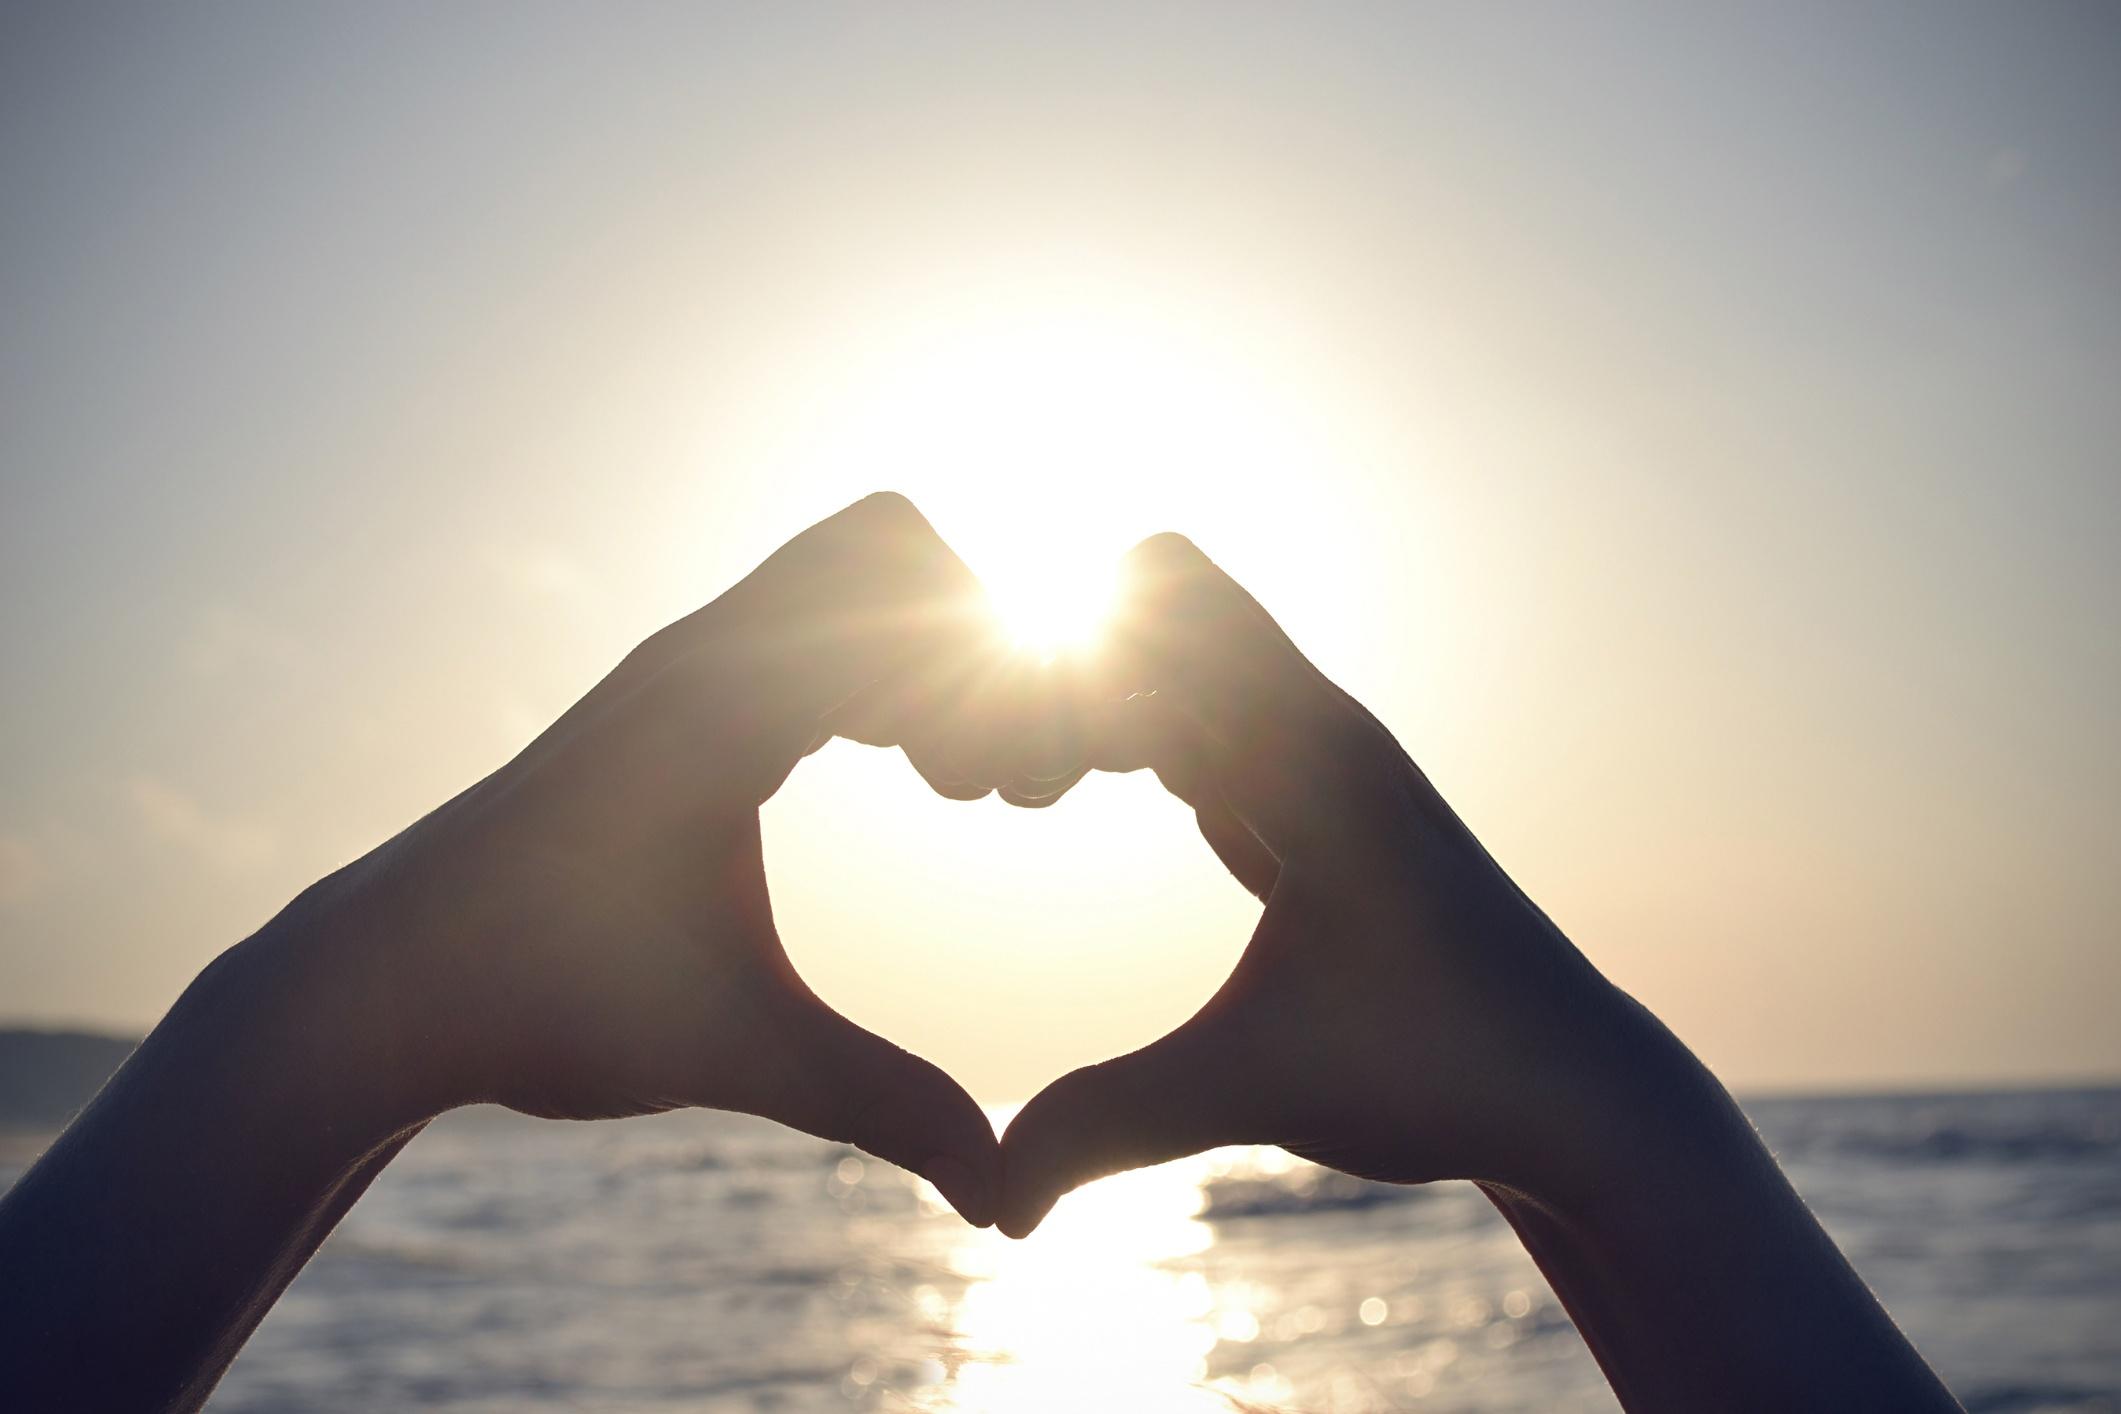 Heart-Hands-ThinkstockPhotos-476023883.jpg